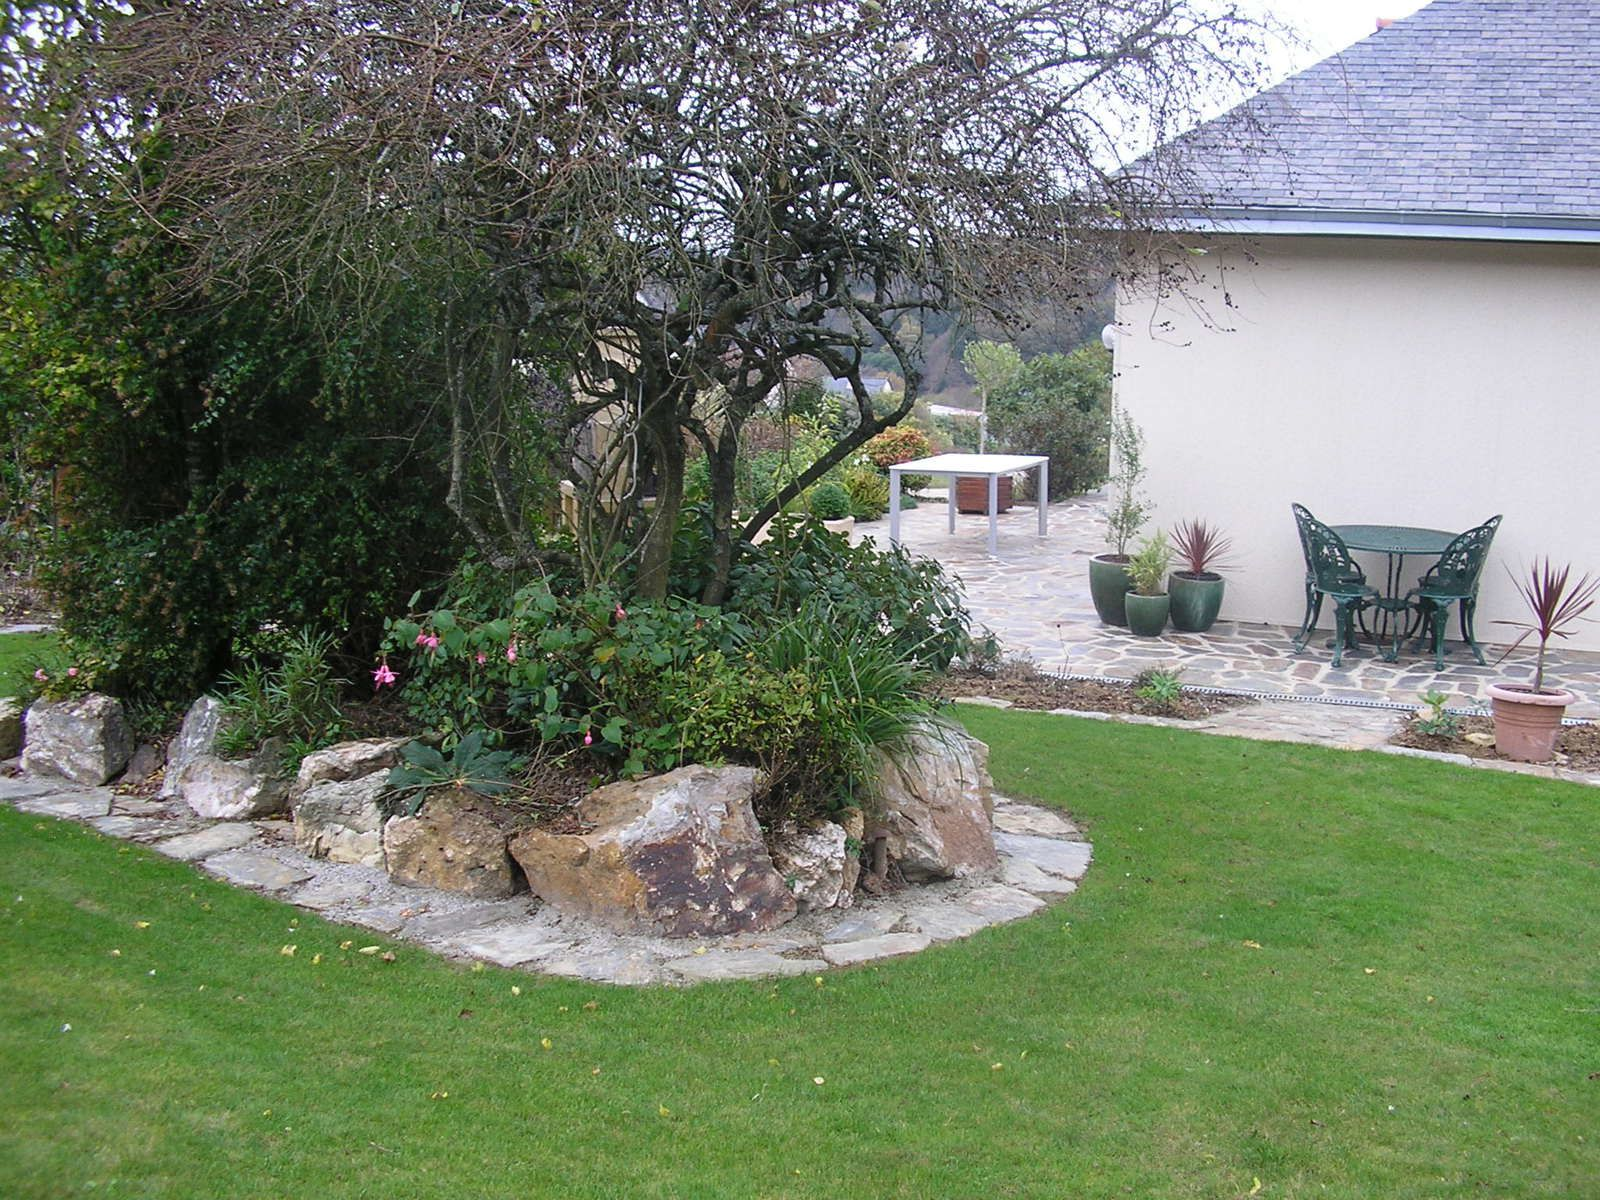 le jardin de mes parents en novembre coeur de marie. Black Bedroom Furniture Sets. Home Design Ideas